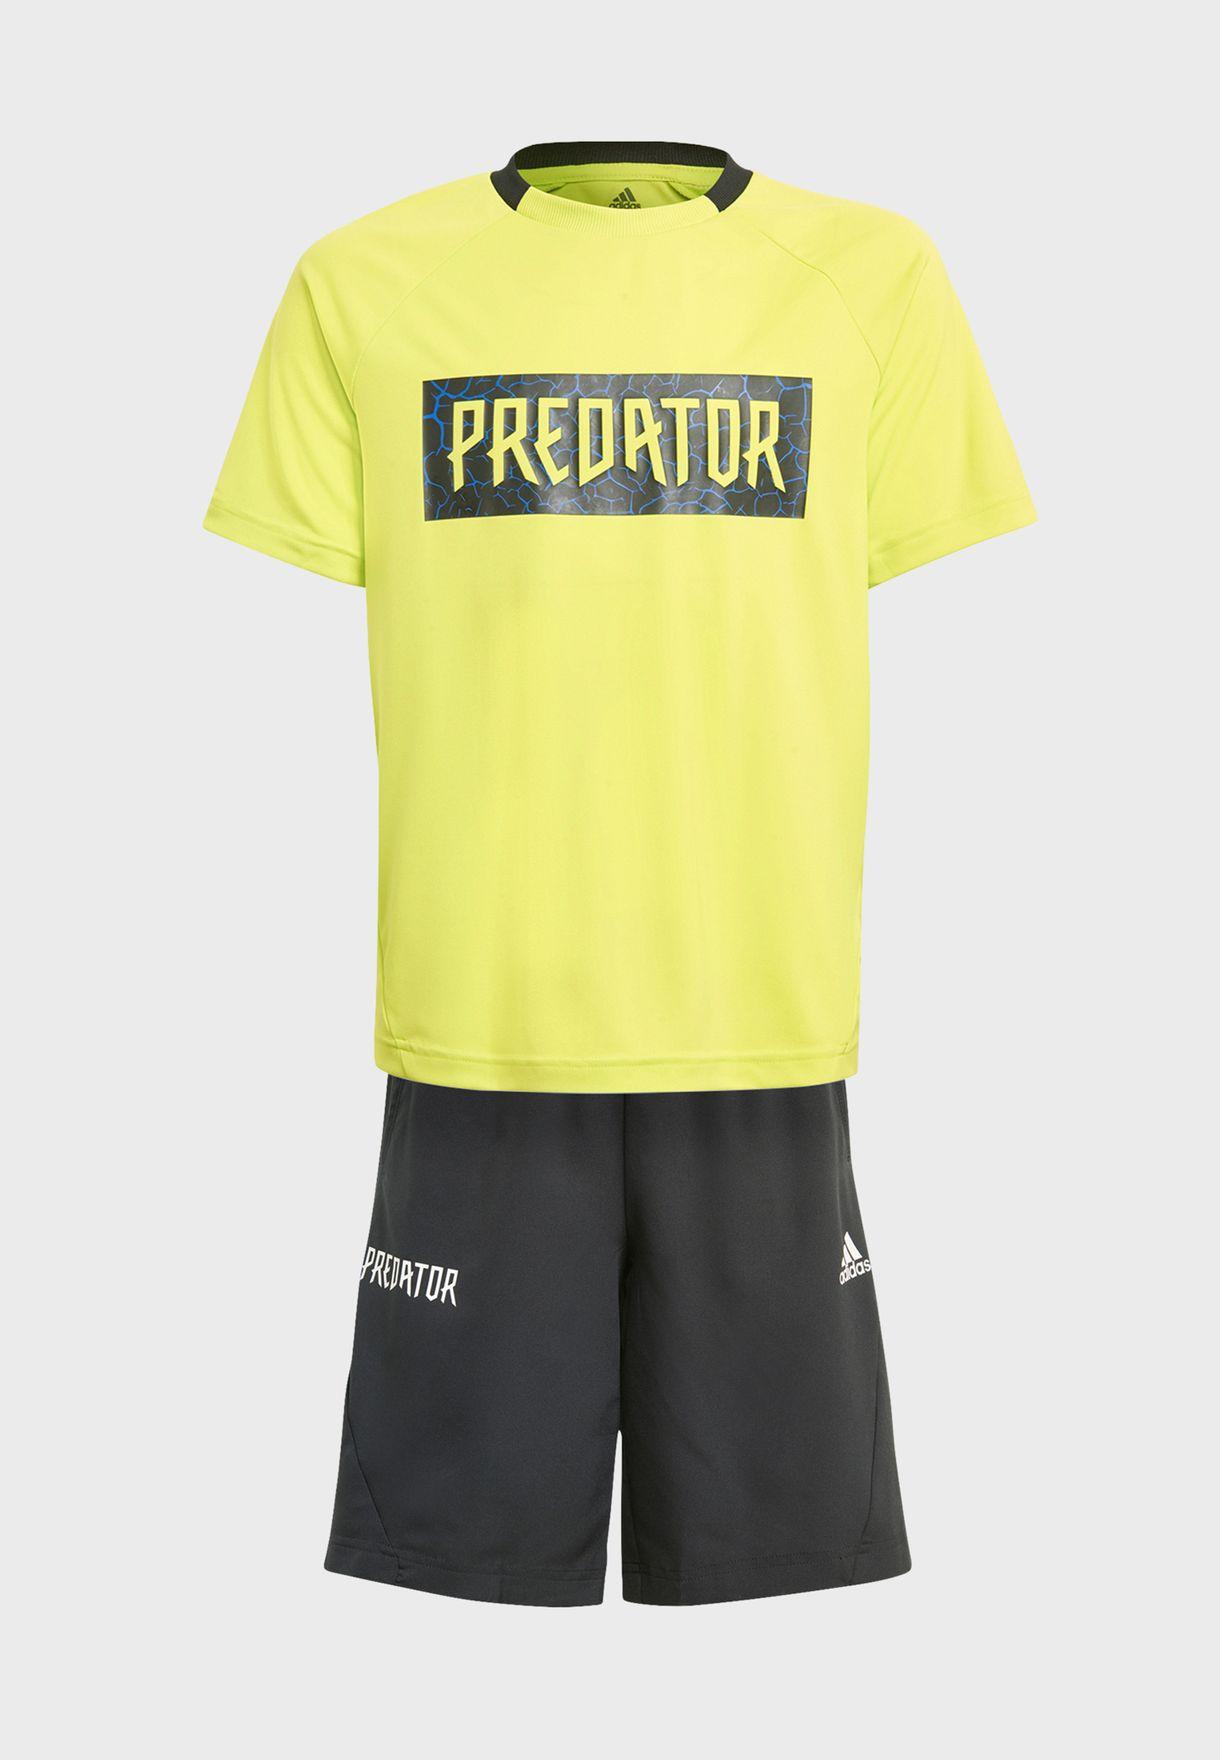 Youth Predator Aero Ready Set